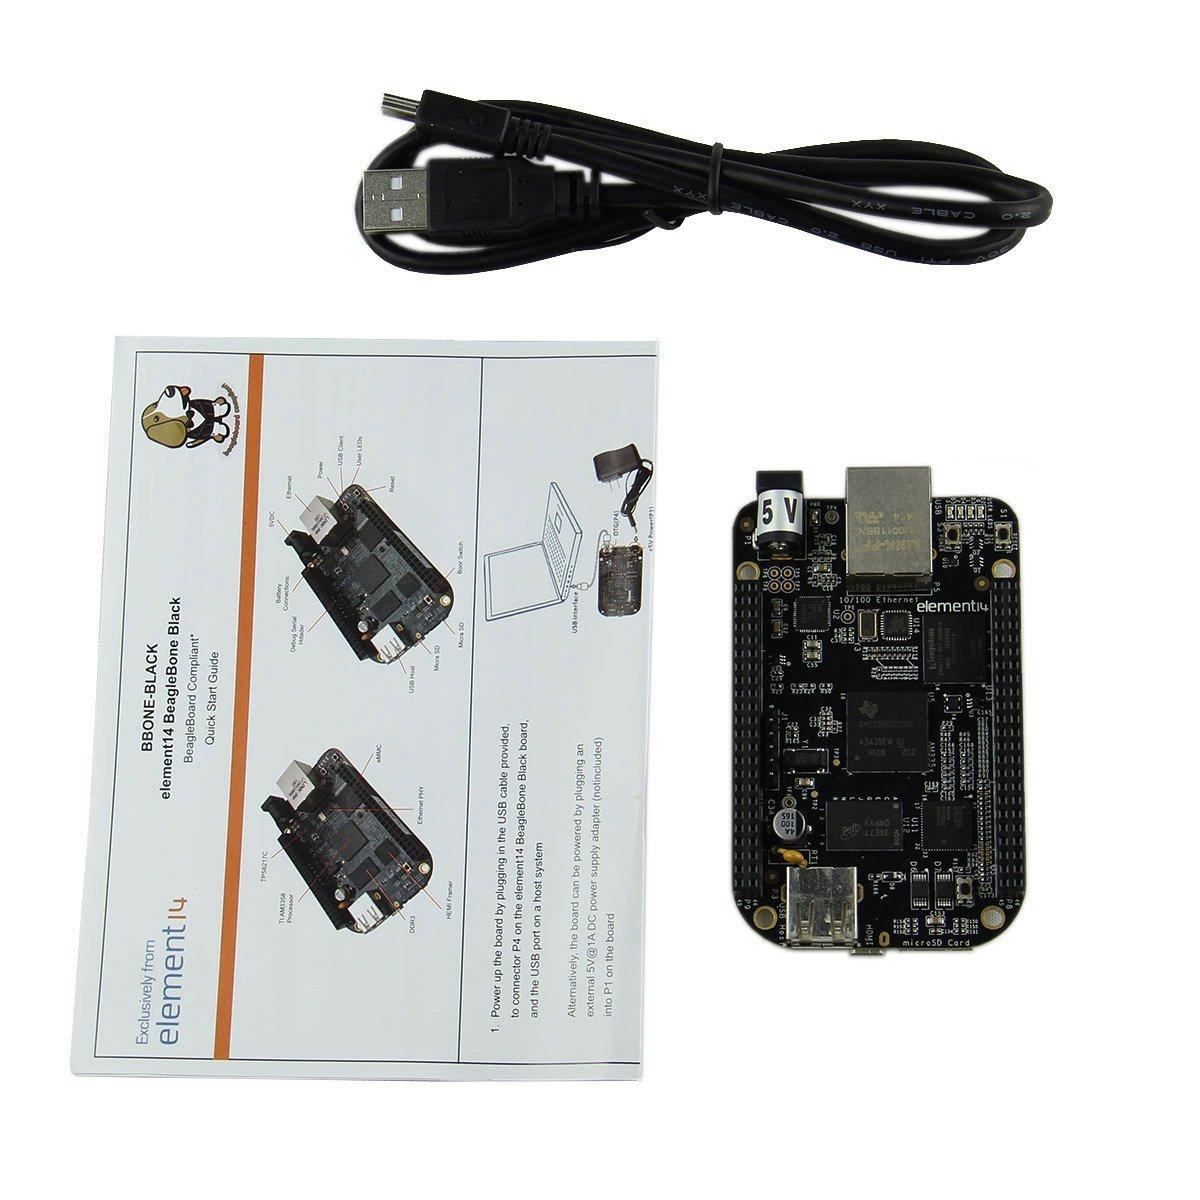 Embest BeagleBone BB Black 1GHz TI AM3358x Cortex-A8 Development Board REV C Version(China (Mainland))